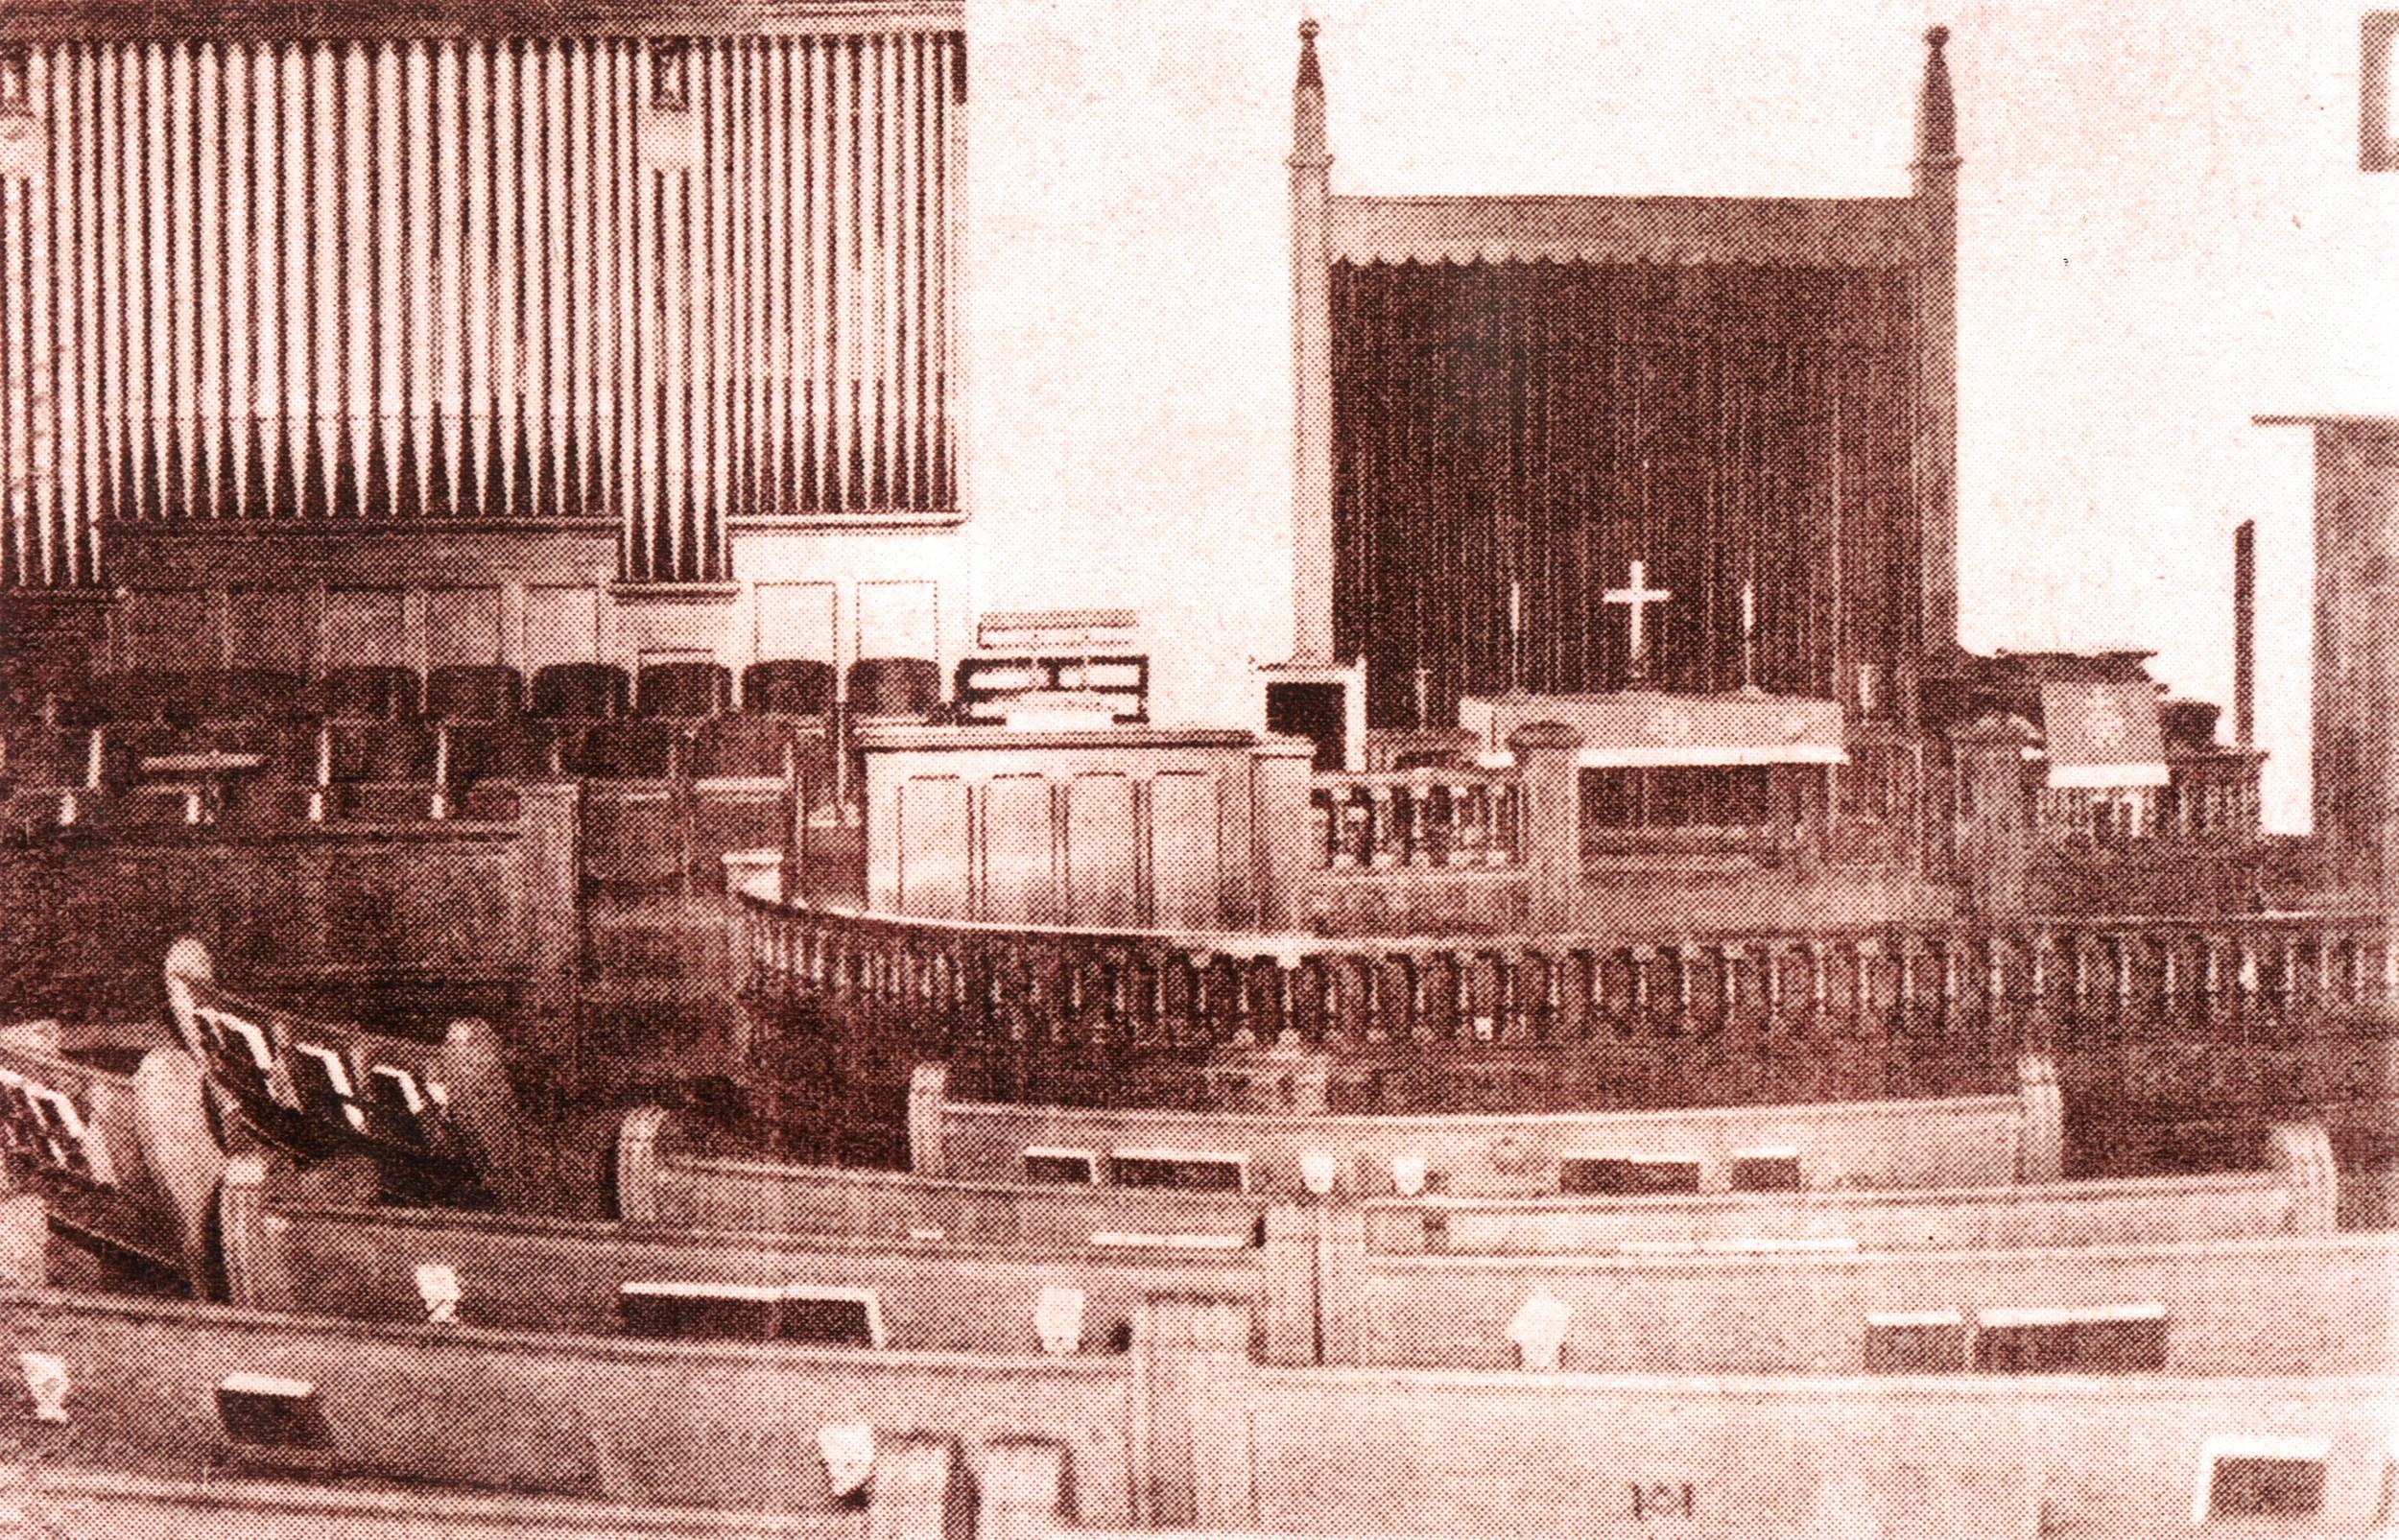 1910 Brick Building designed by Diedrich Rulfs